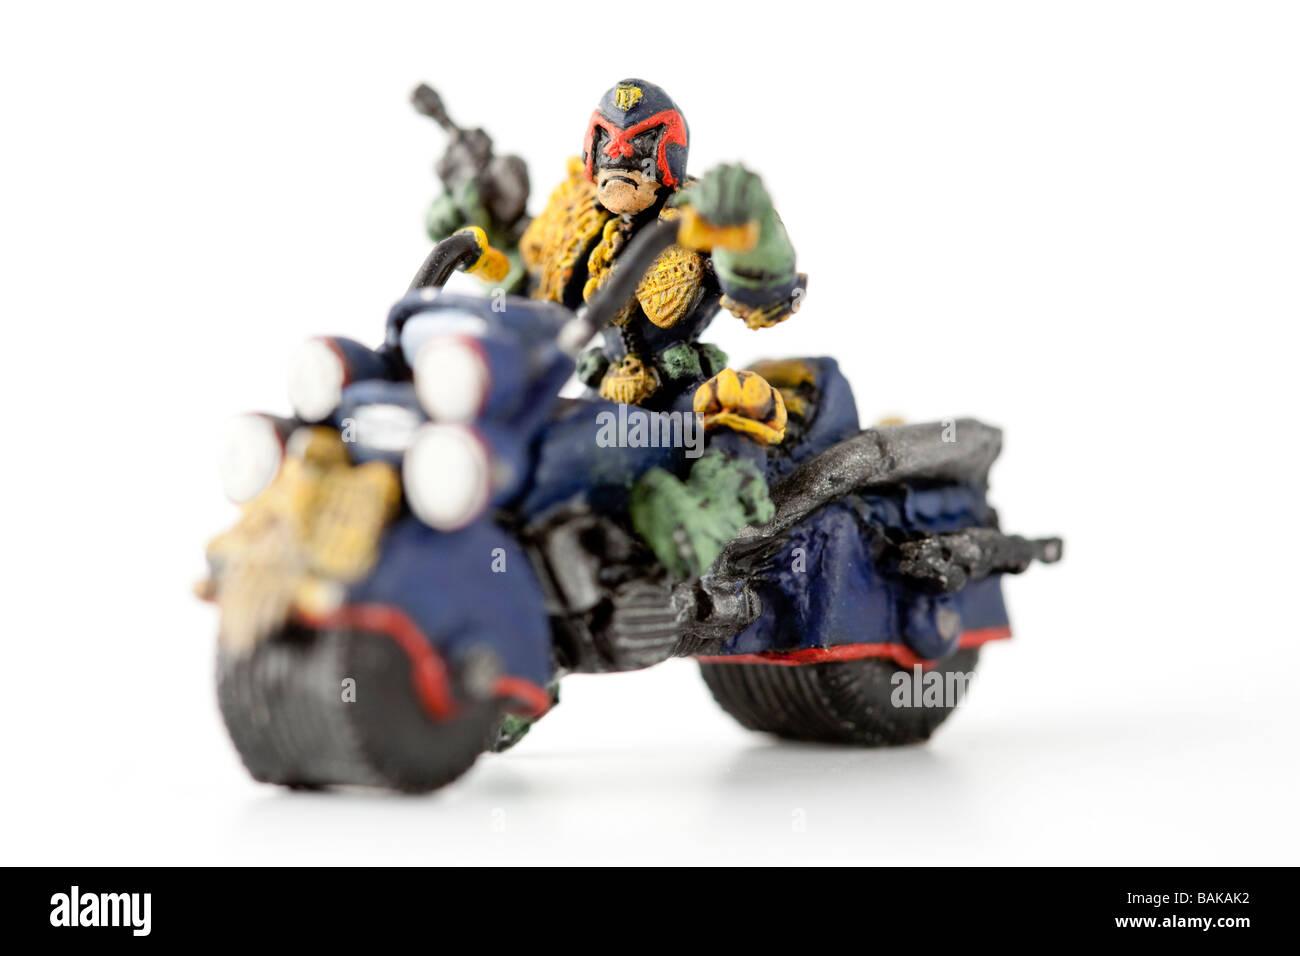 Figure of Judge Dredd from british comic book 2000 AD Stock Photo